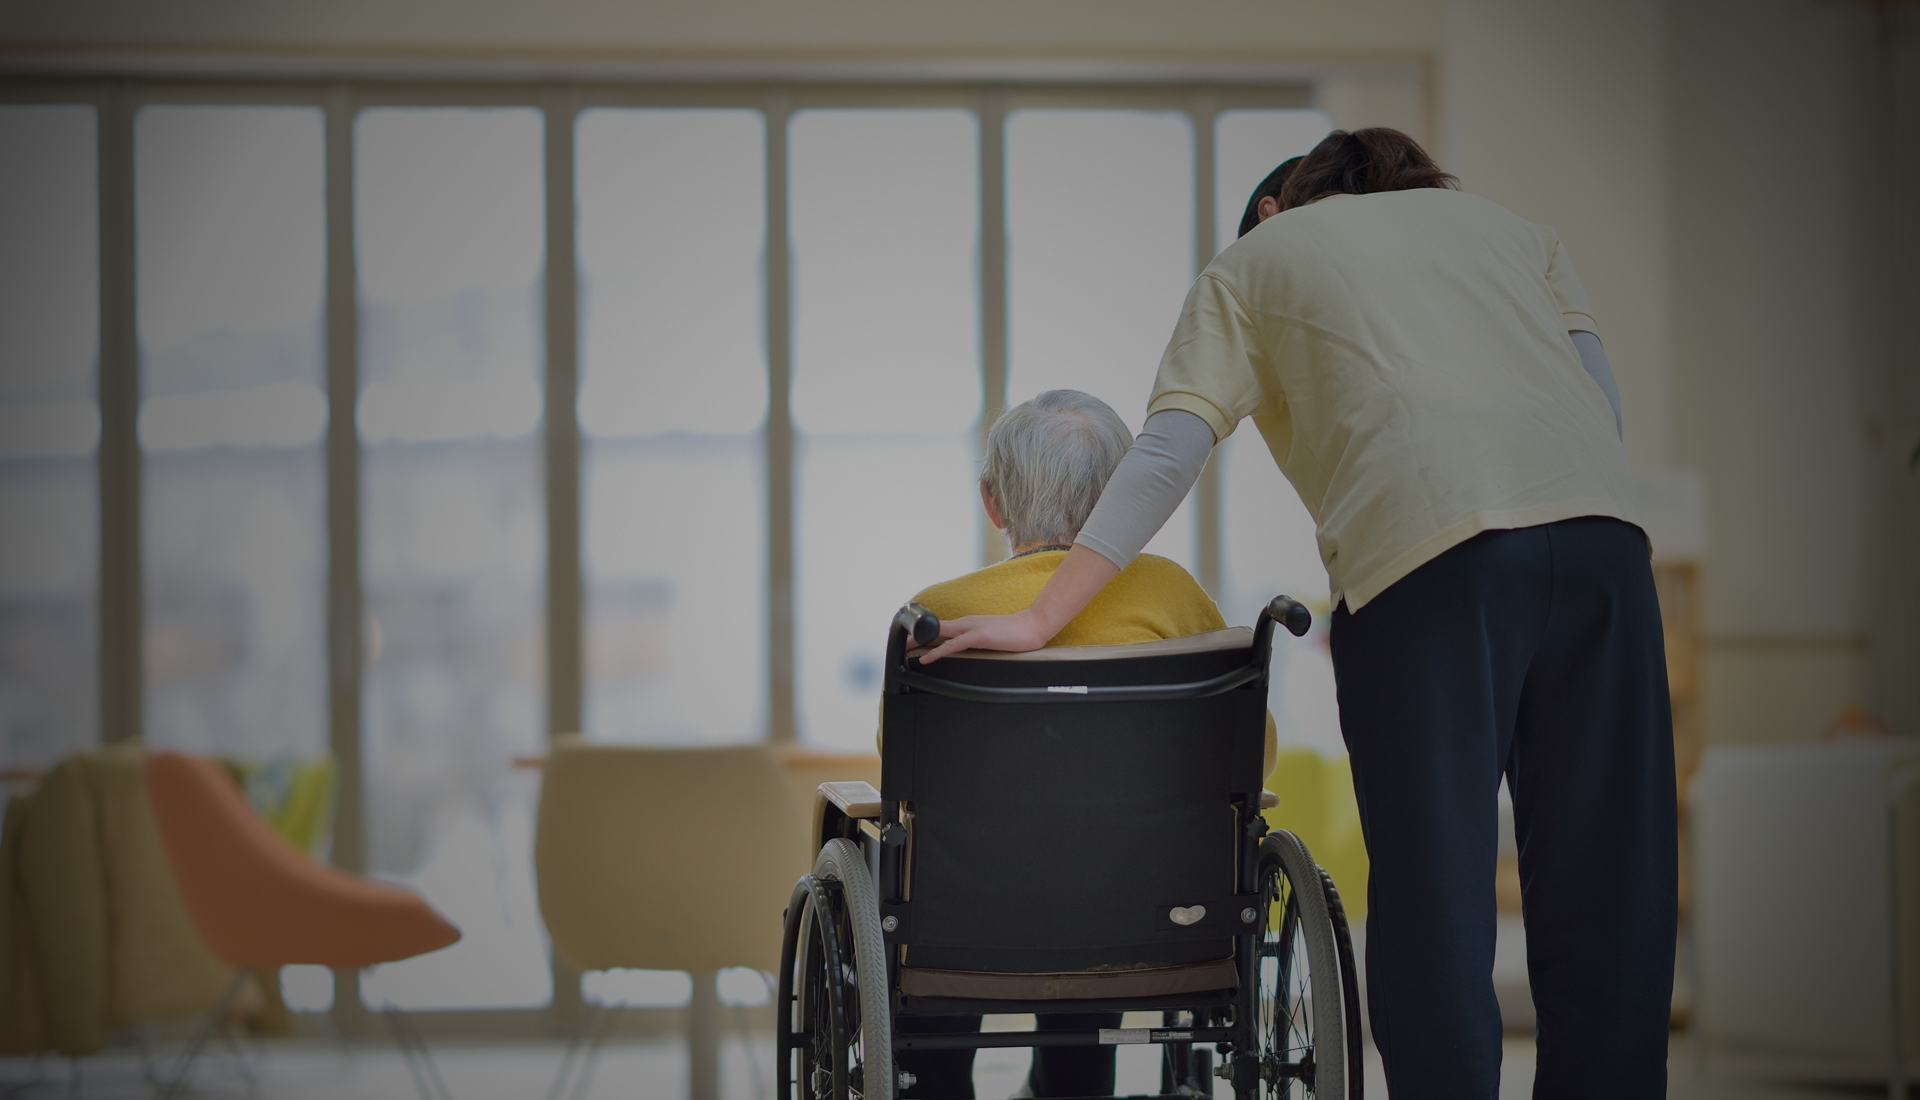 sp&r aged care